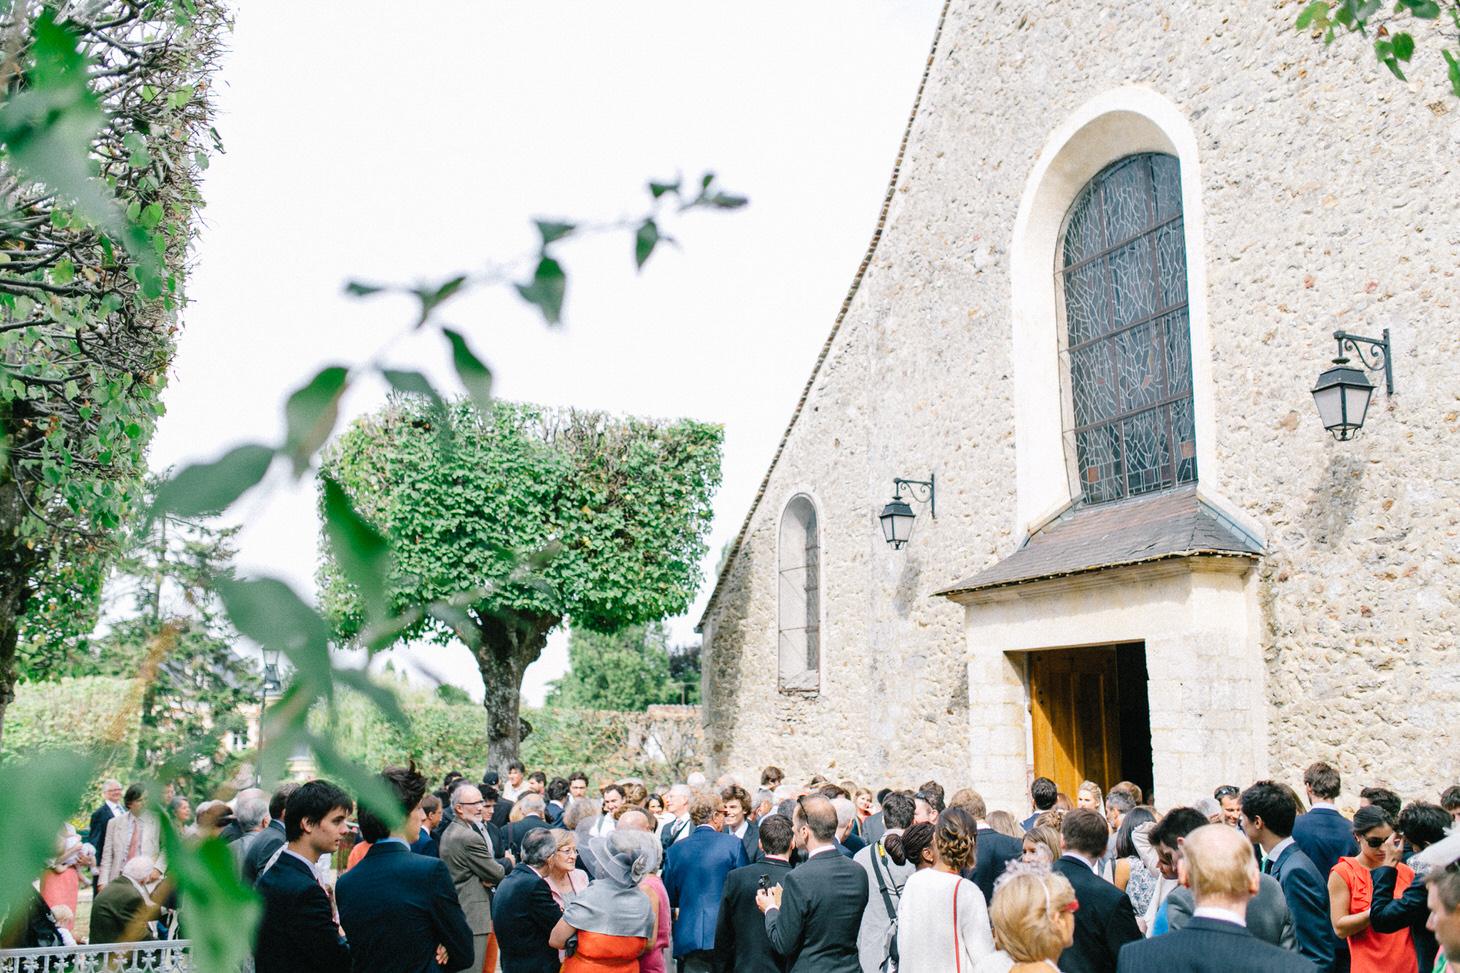 photographe-mariage-paris-montfort-l-amaury-041